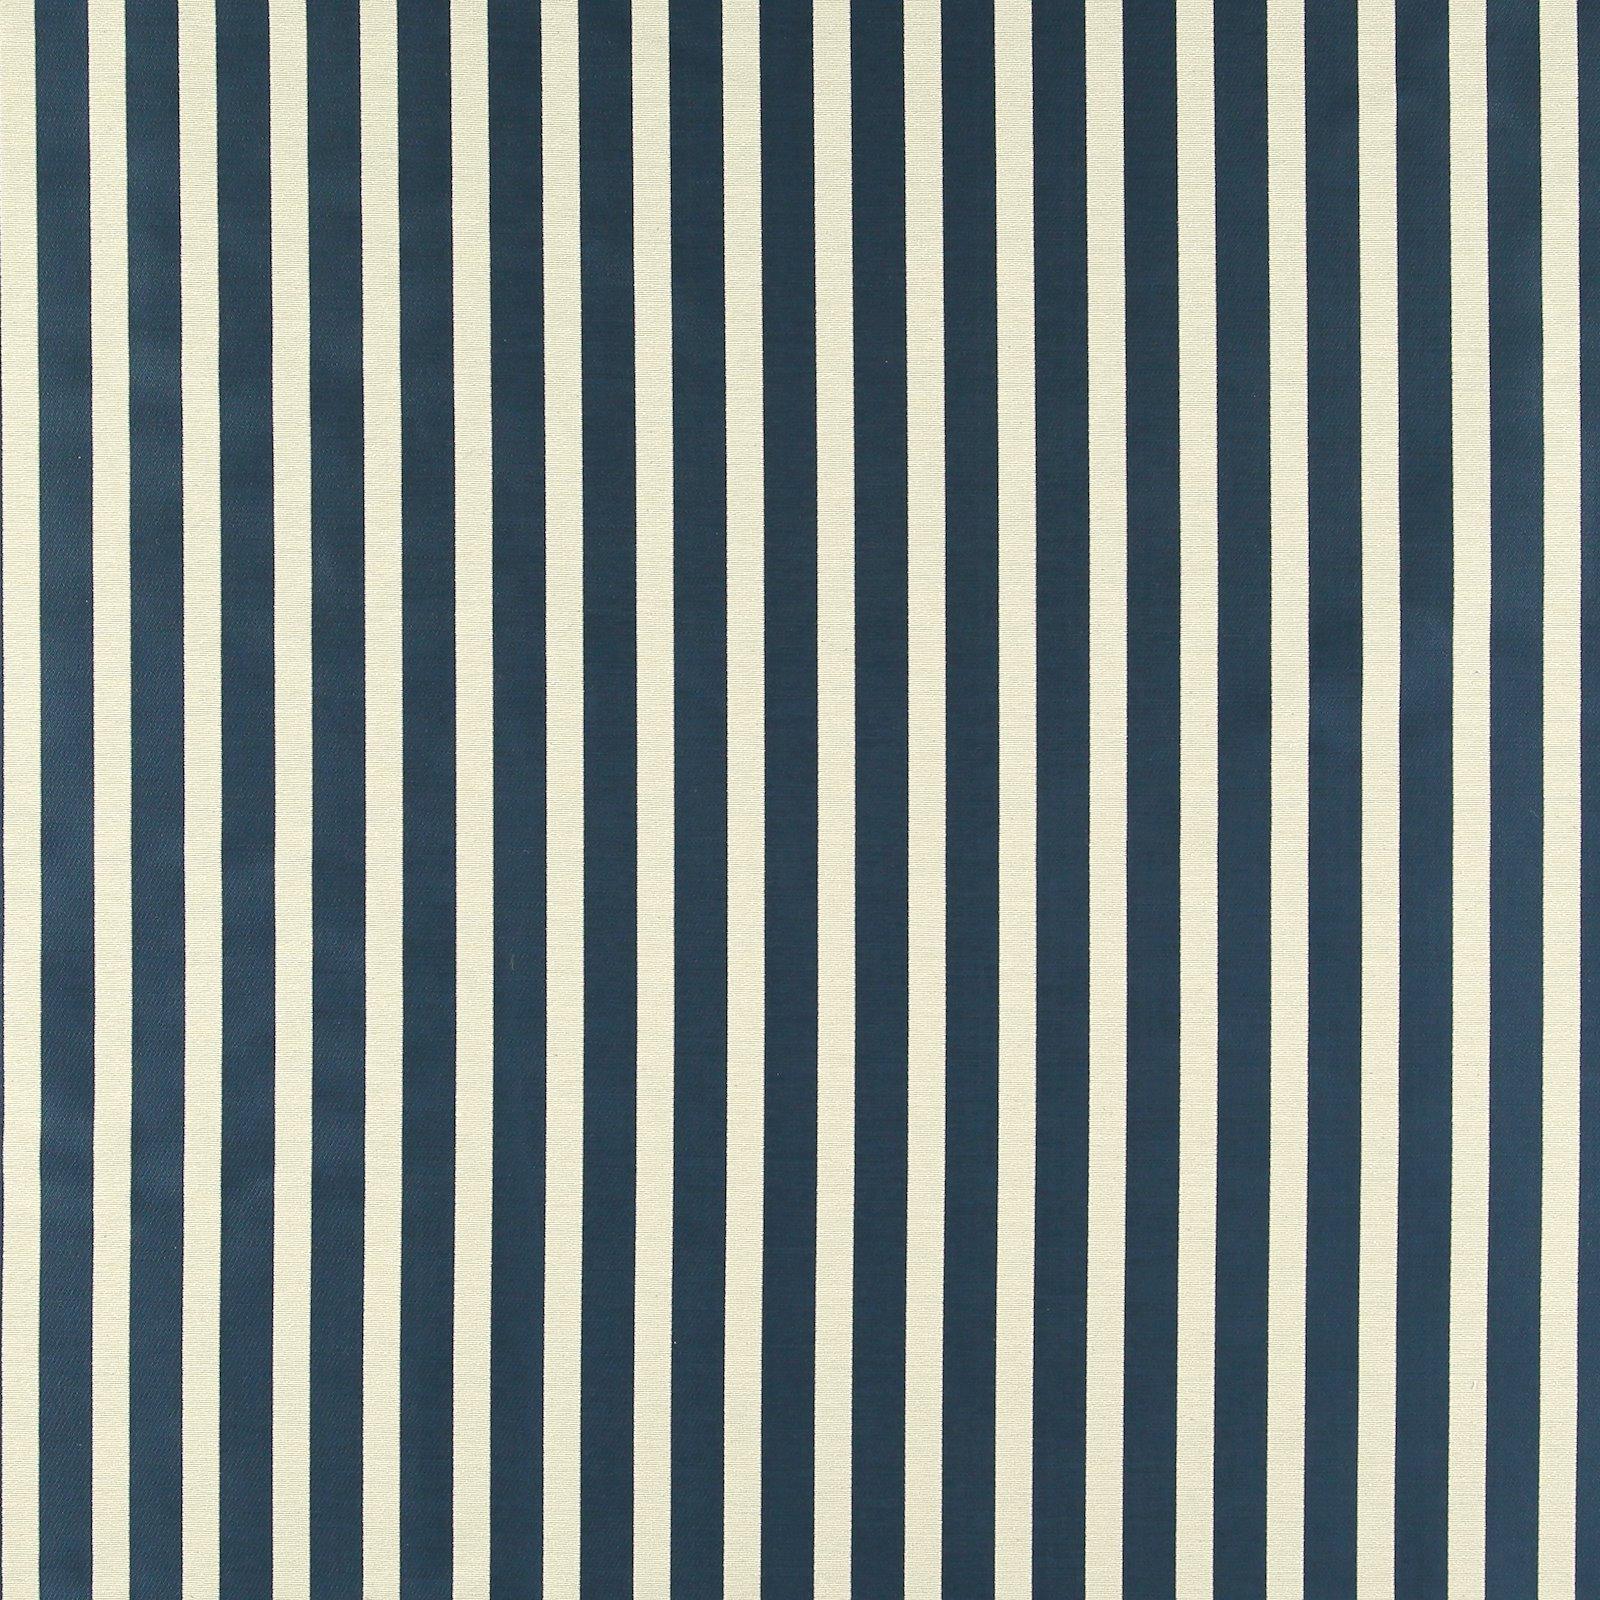 Jacquard yarn dyed petrol/sand stripe 824066_pack_sp